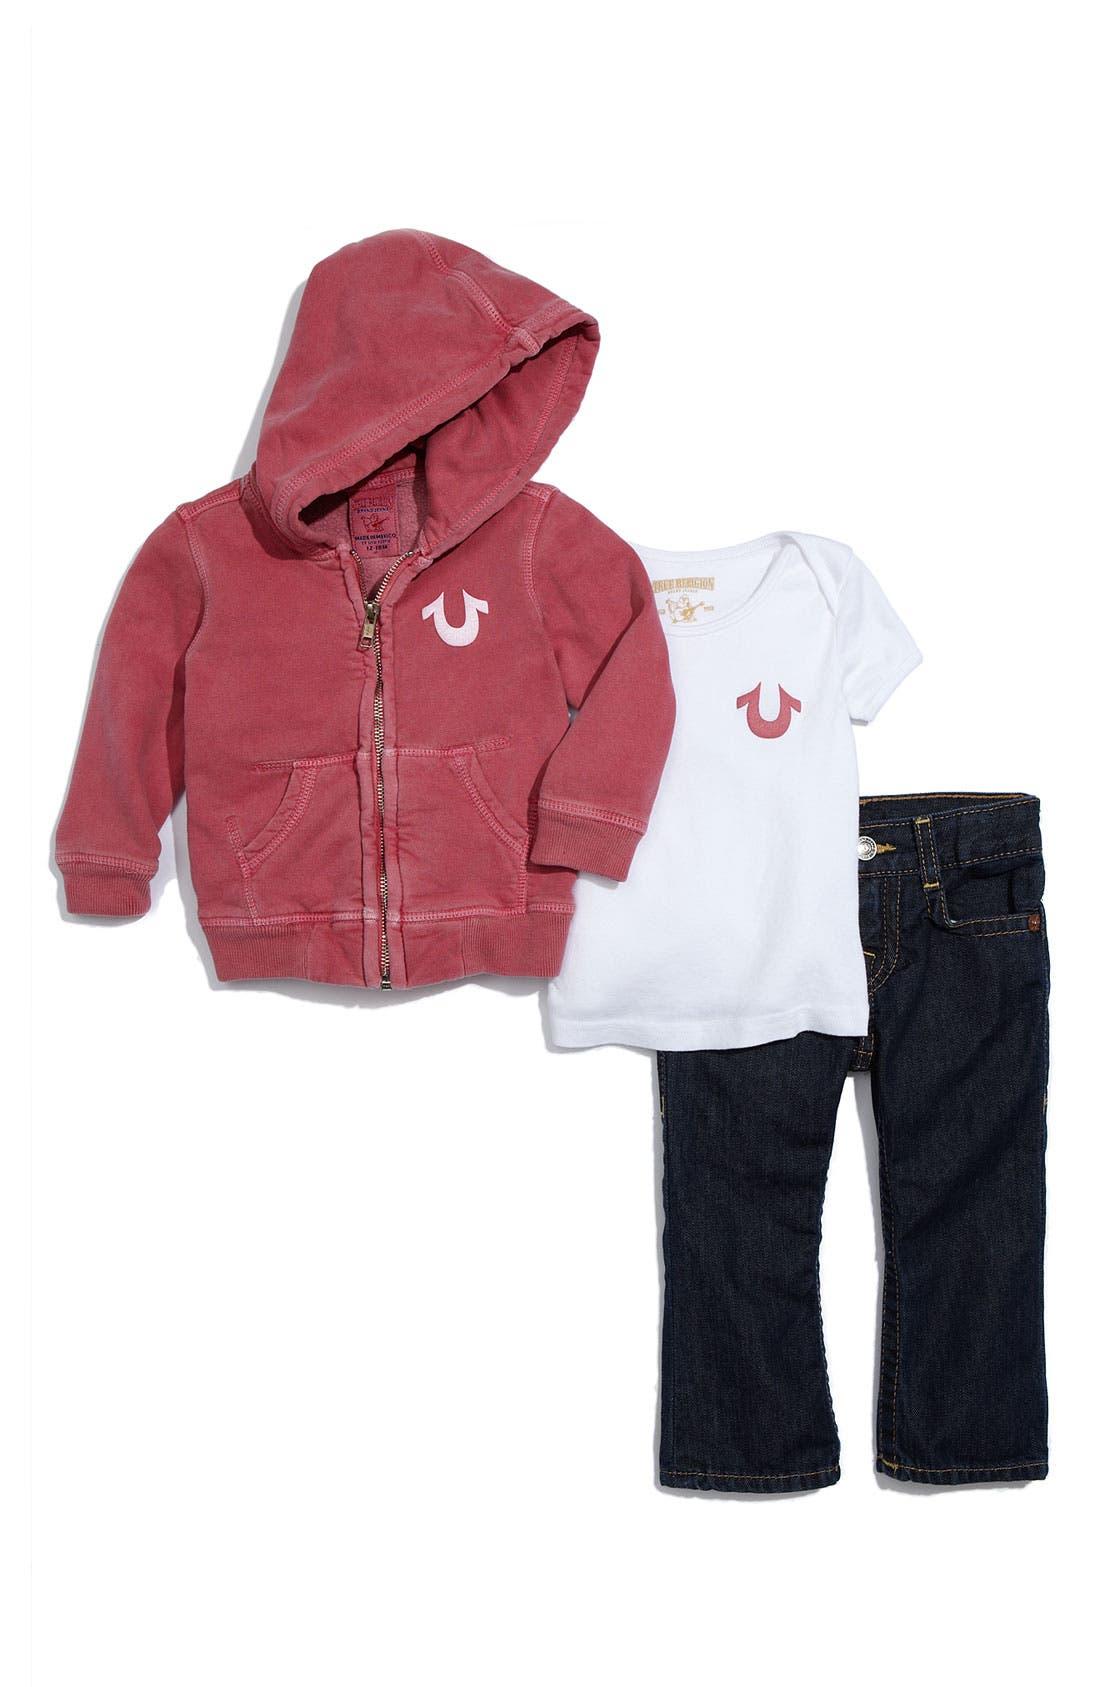 Main Image - True Religion Brand Jeans 3-Piece Gift Set (Infant)